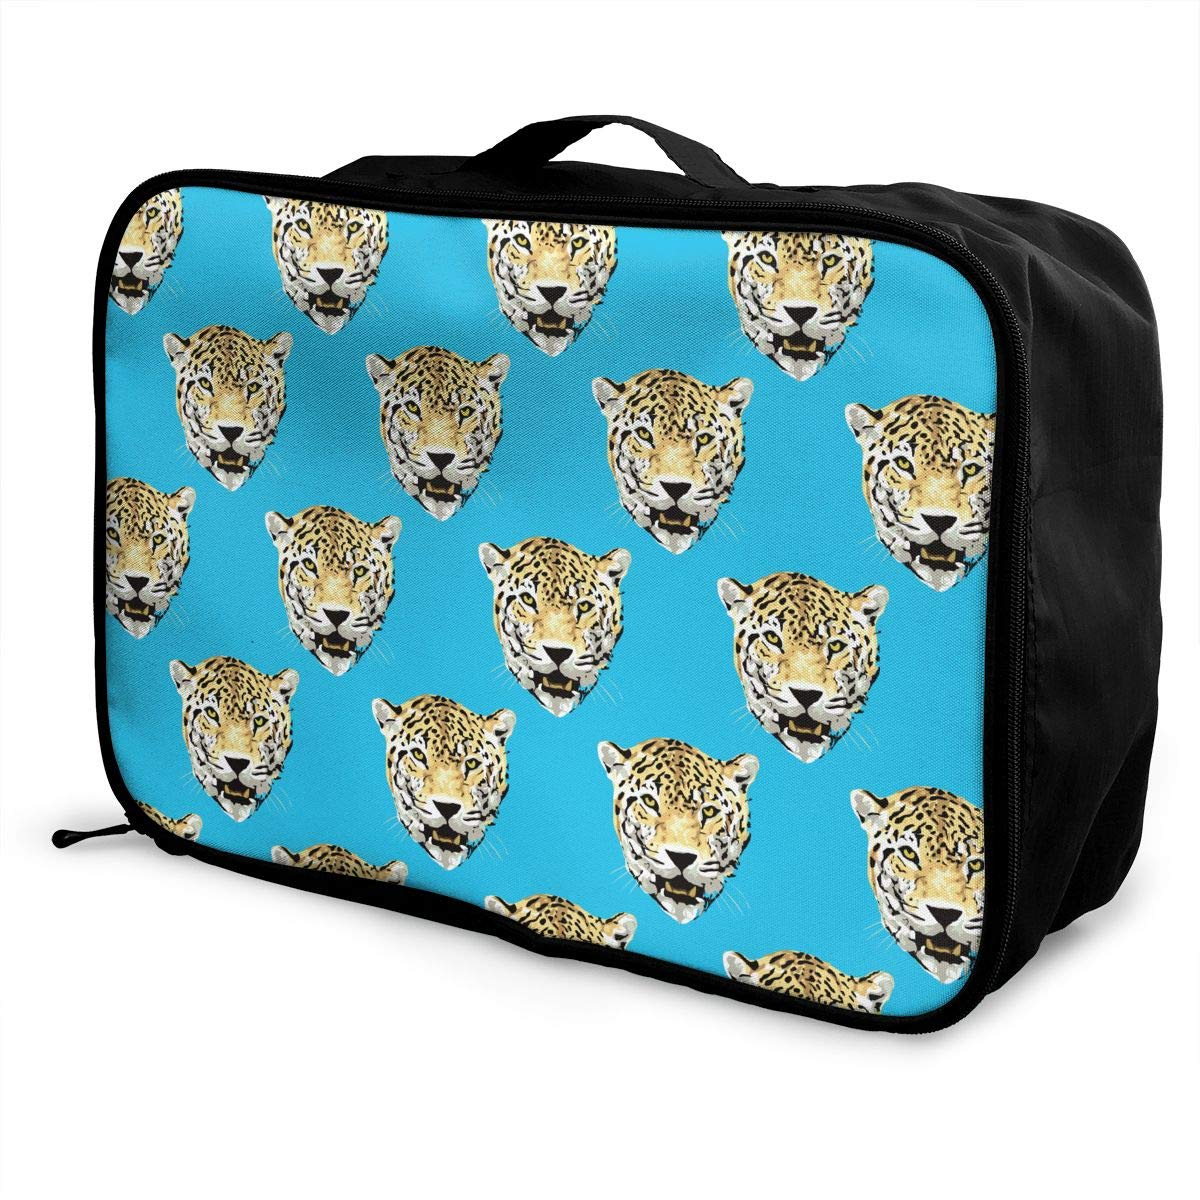 YueLJB Wild Leopard Head Lightweight Large Capacity Portable Luggage Bag Travel Duffel Bag Storage Carry Luggage Duffle Tote Bag